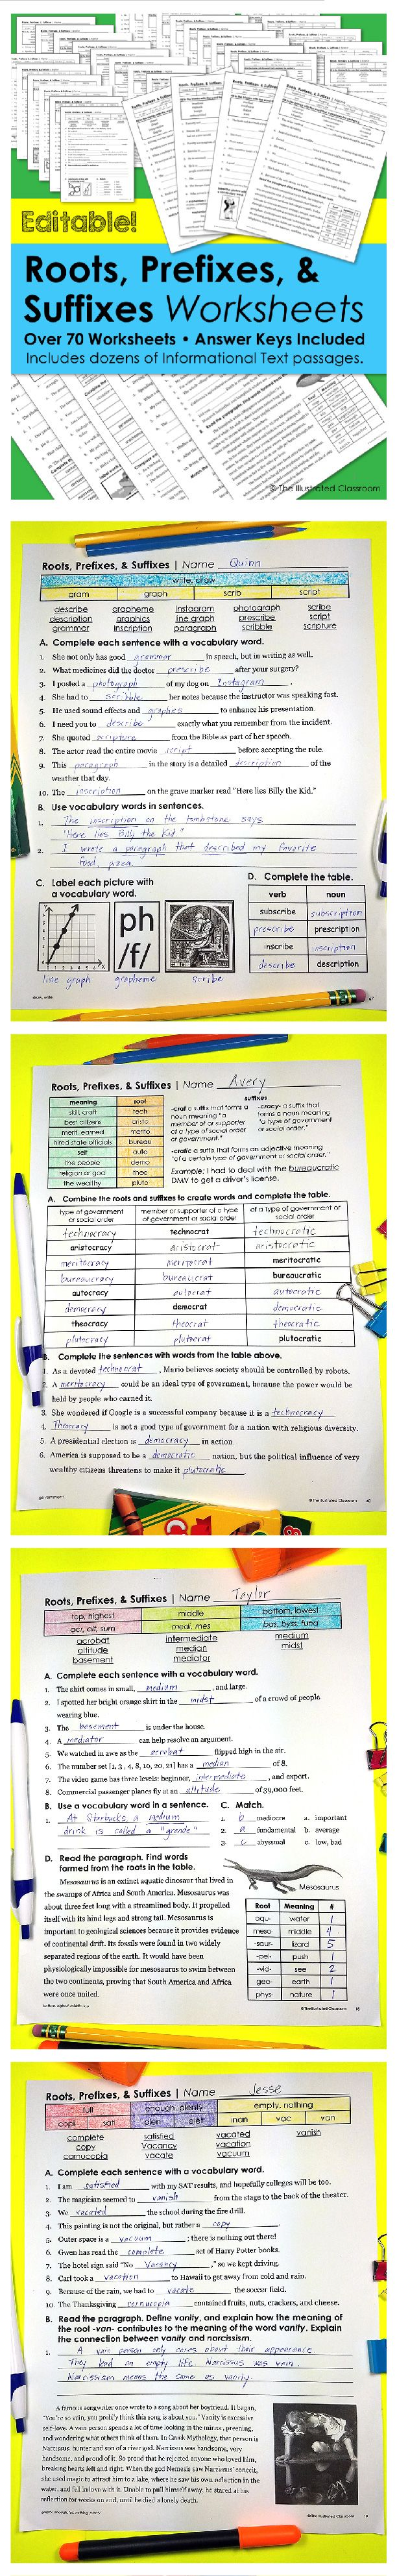 hight resolution of Self Esteem Worksheets Building Confidence And Self Esteem on Best  Worksheets Collection 6628